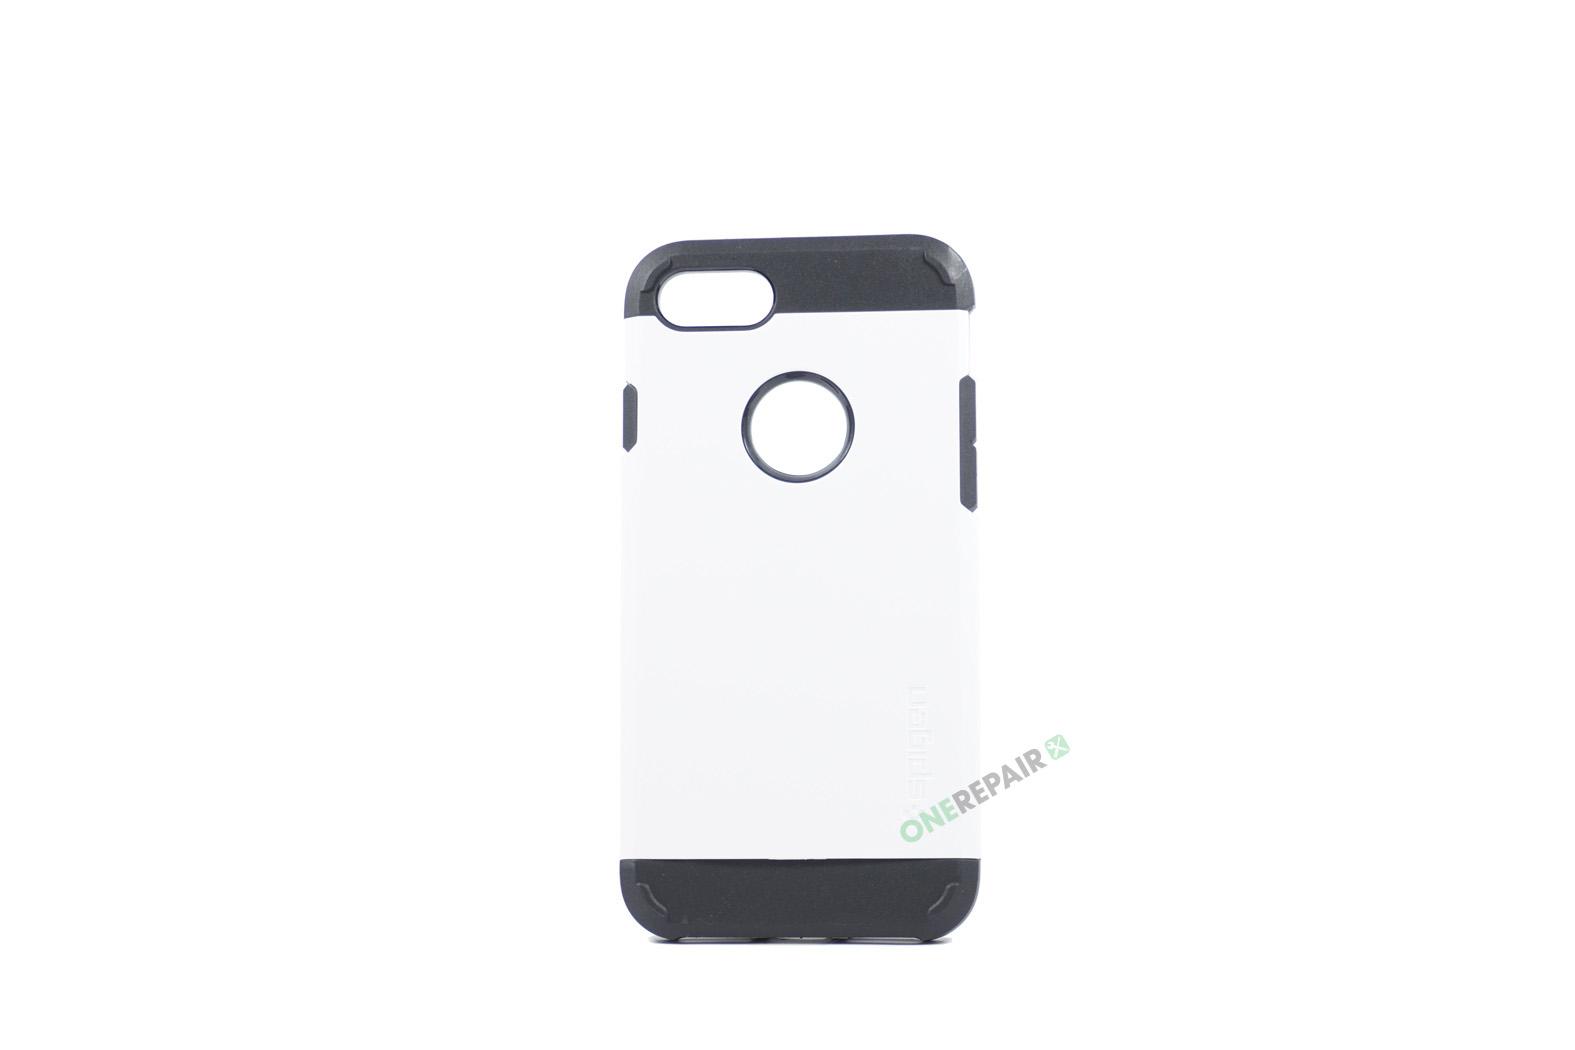 350768_iPhone_7_8_Armorcover_Hardcase_Cover_Hvid_OneRepair_WM_00001